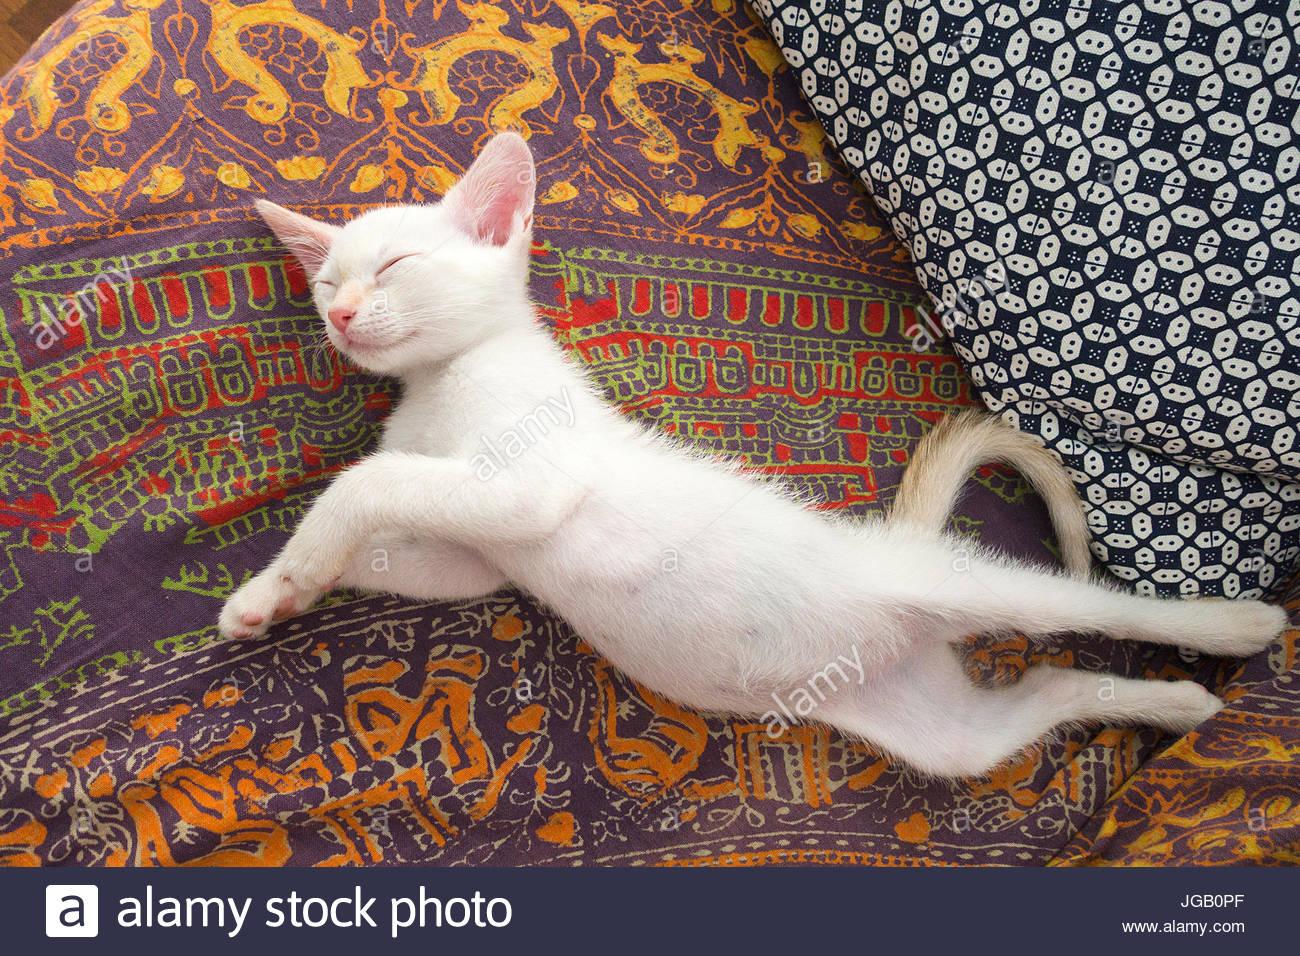 Long cat relaxing - Stock Image